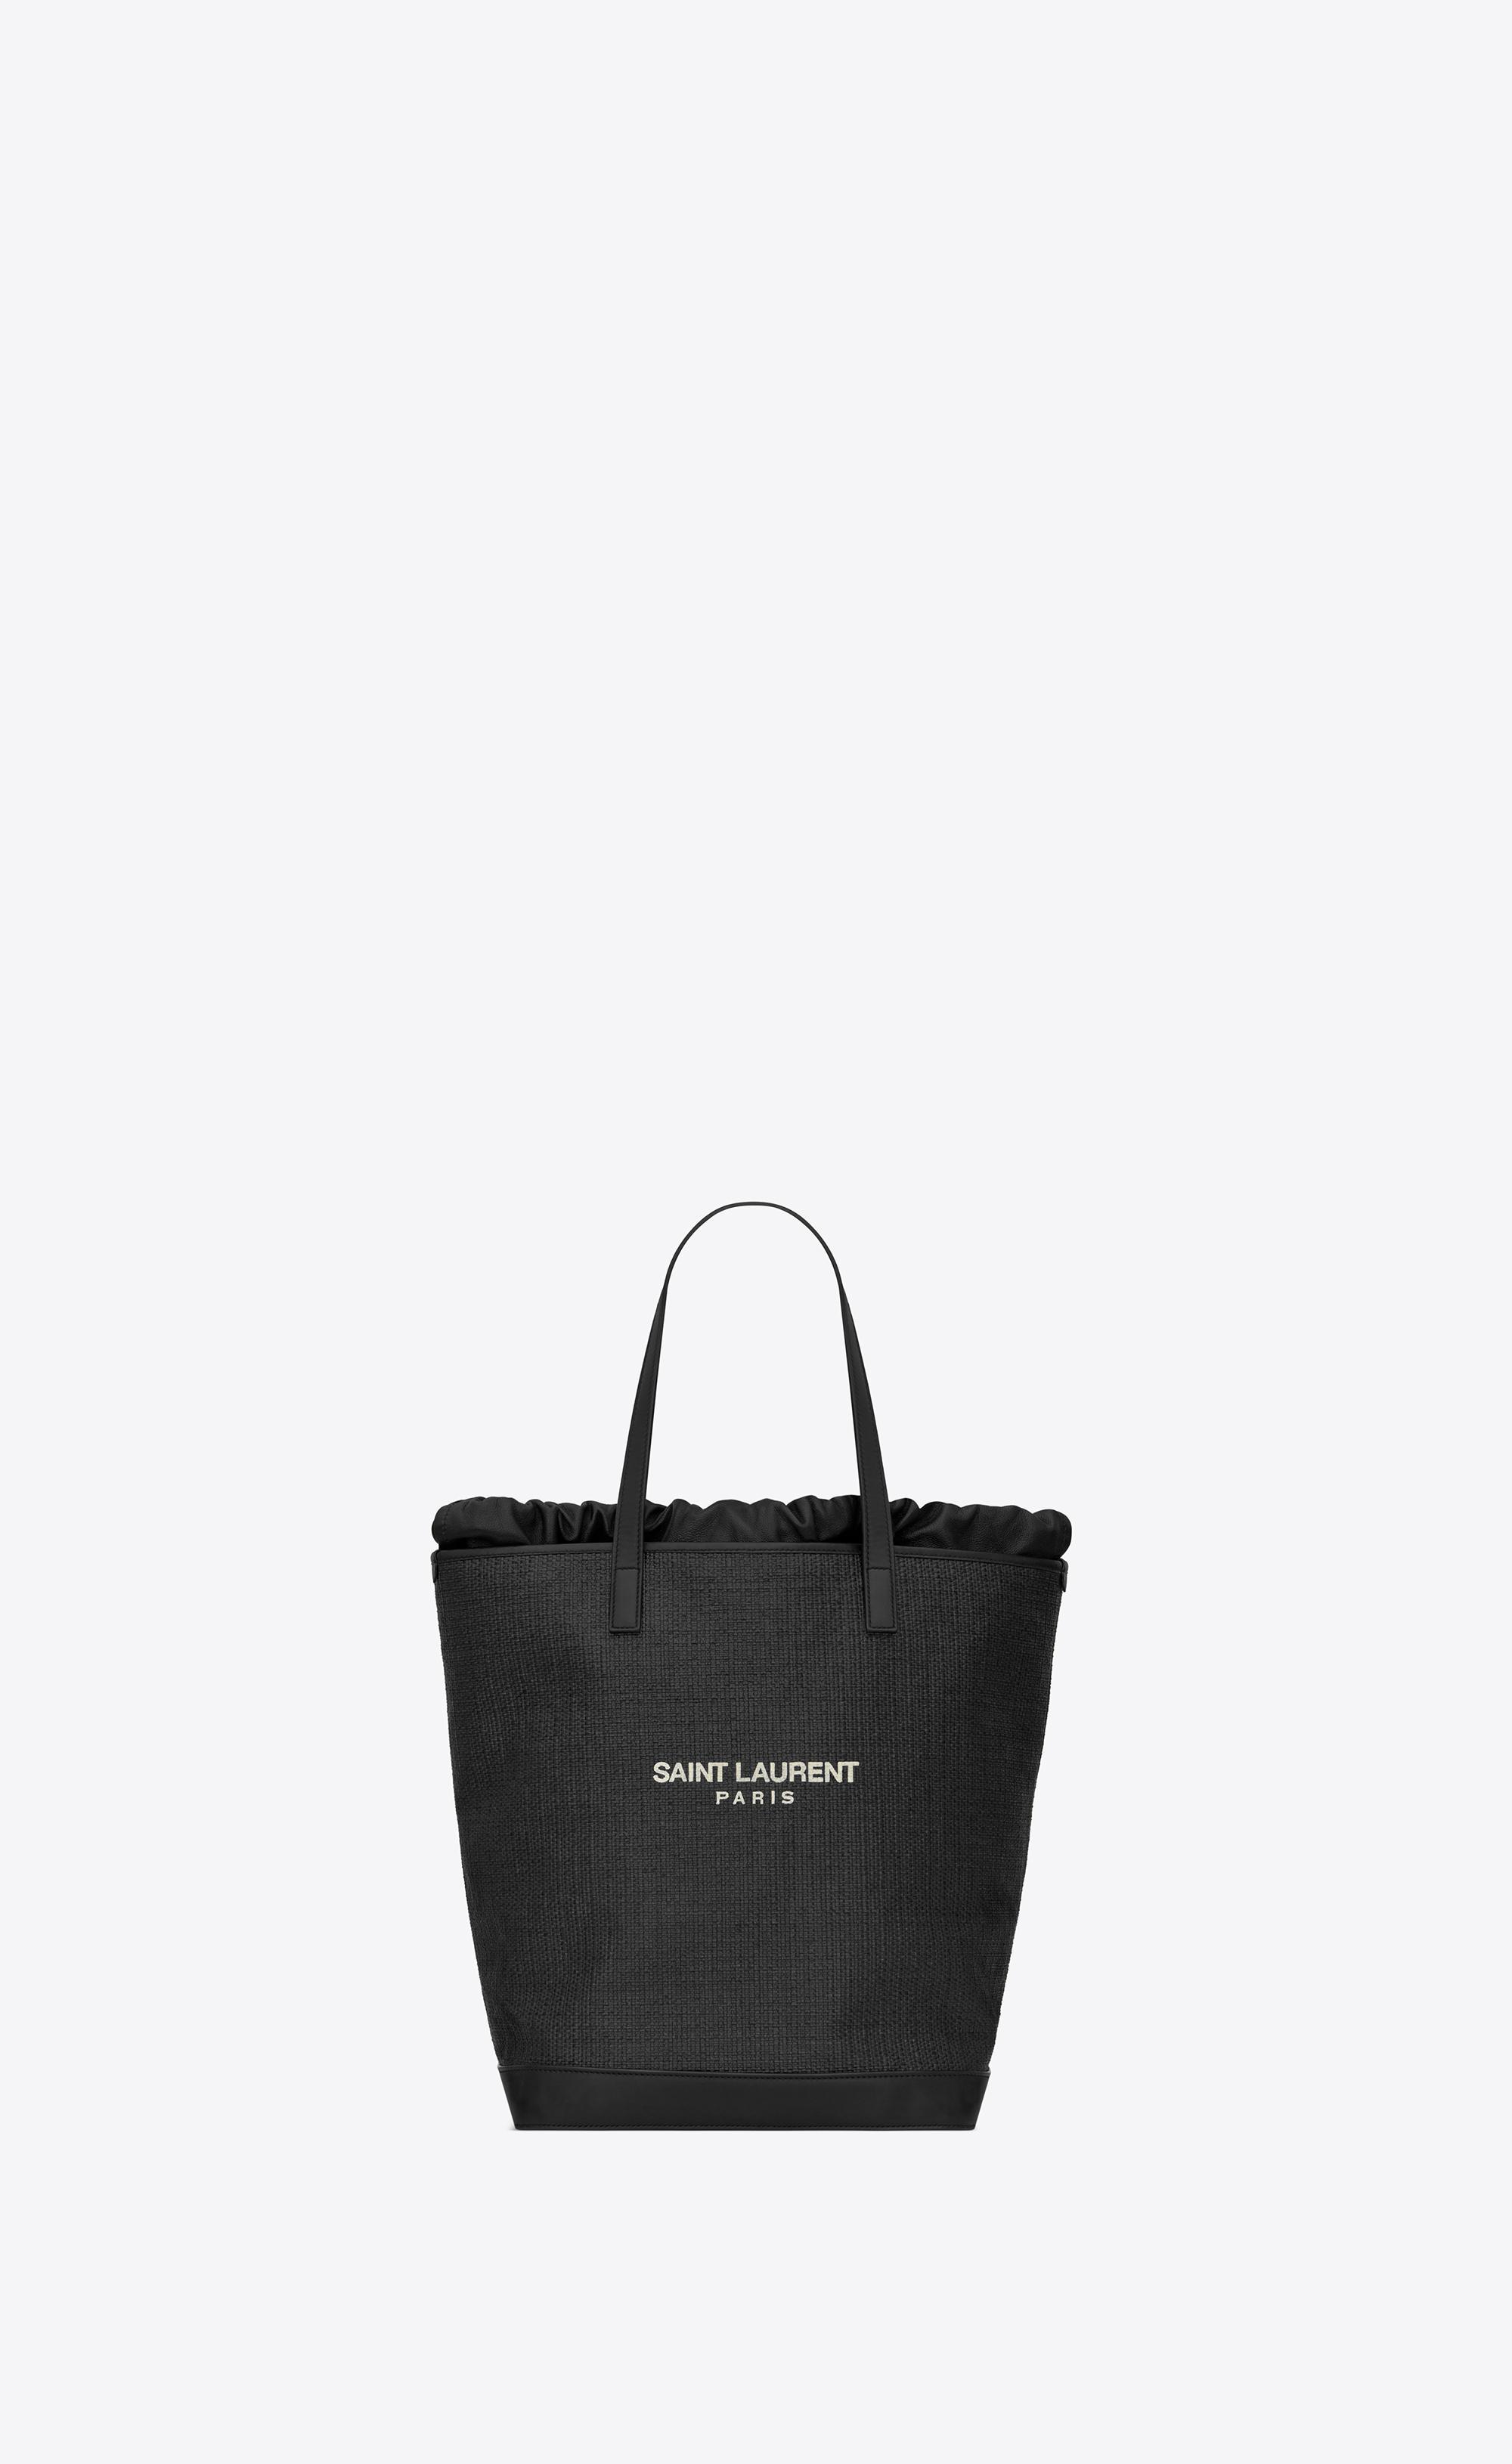 3091336fc156 Saint Laurent - Black Teddy Shopping Bag In Raffia - Lyst. View fullscreen